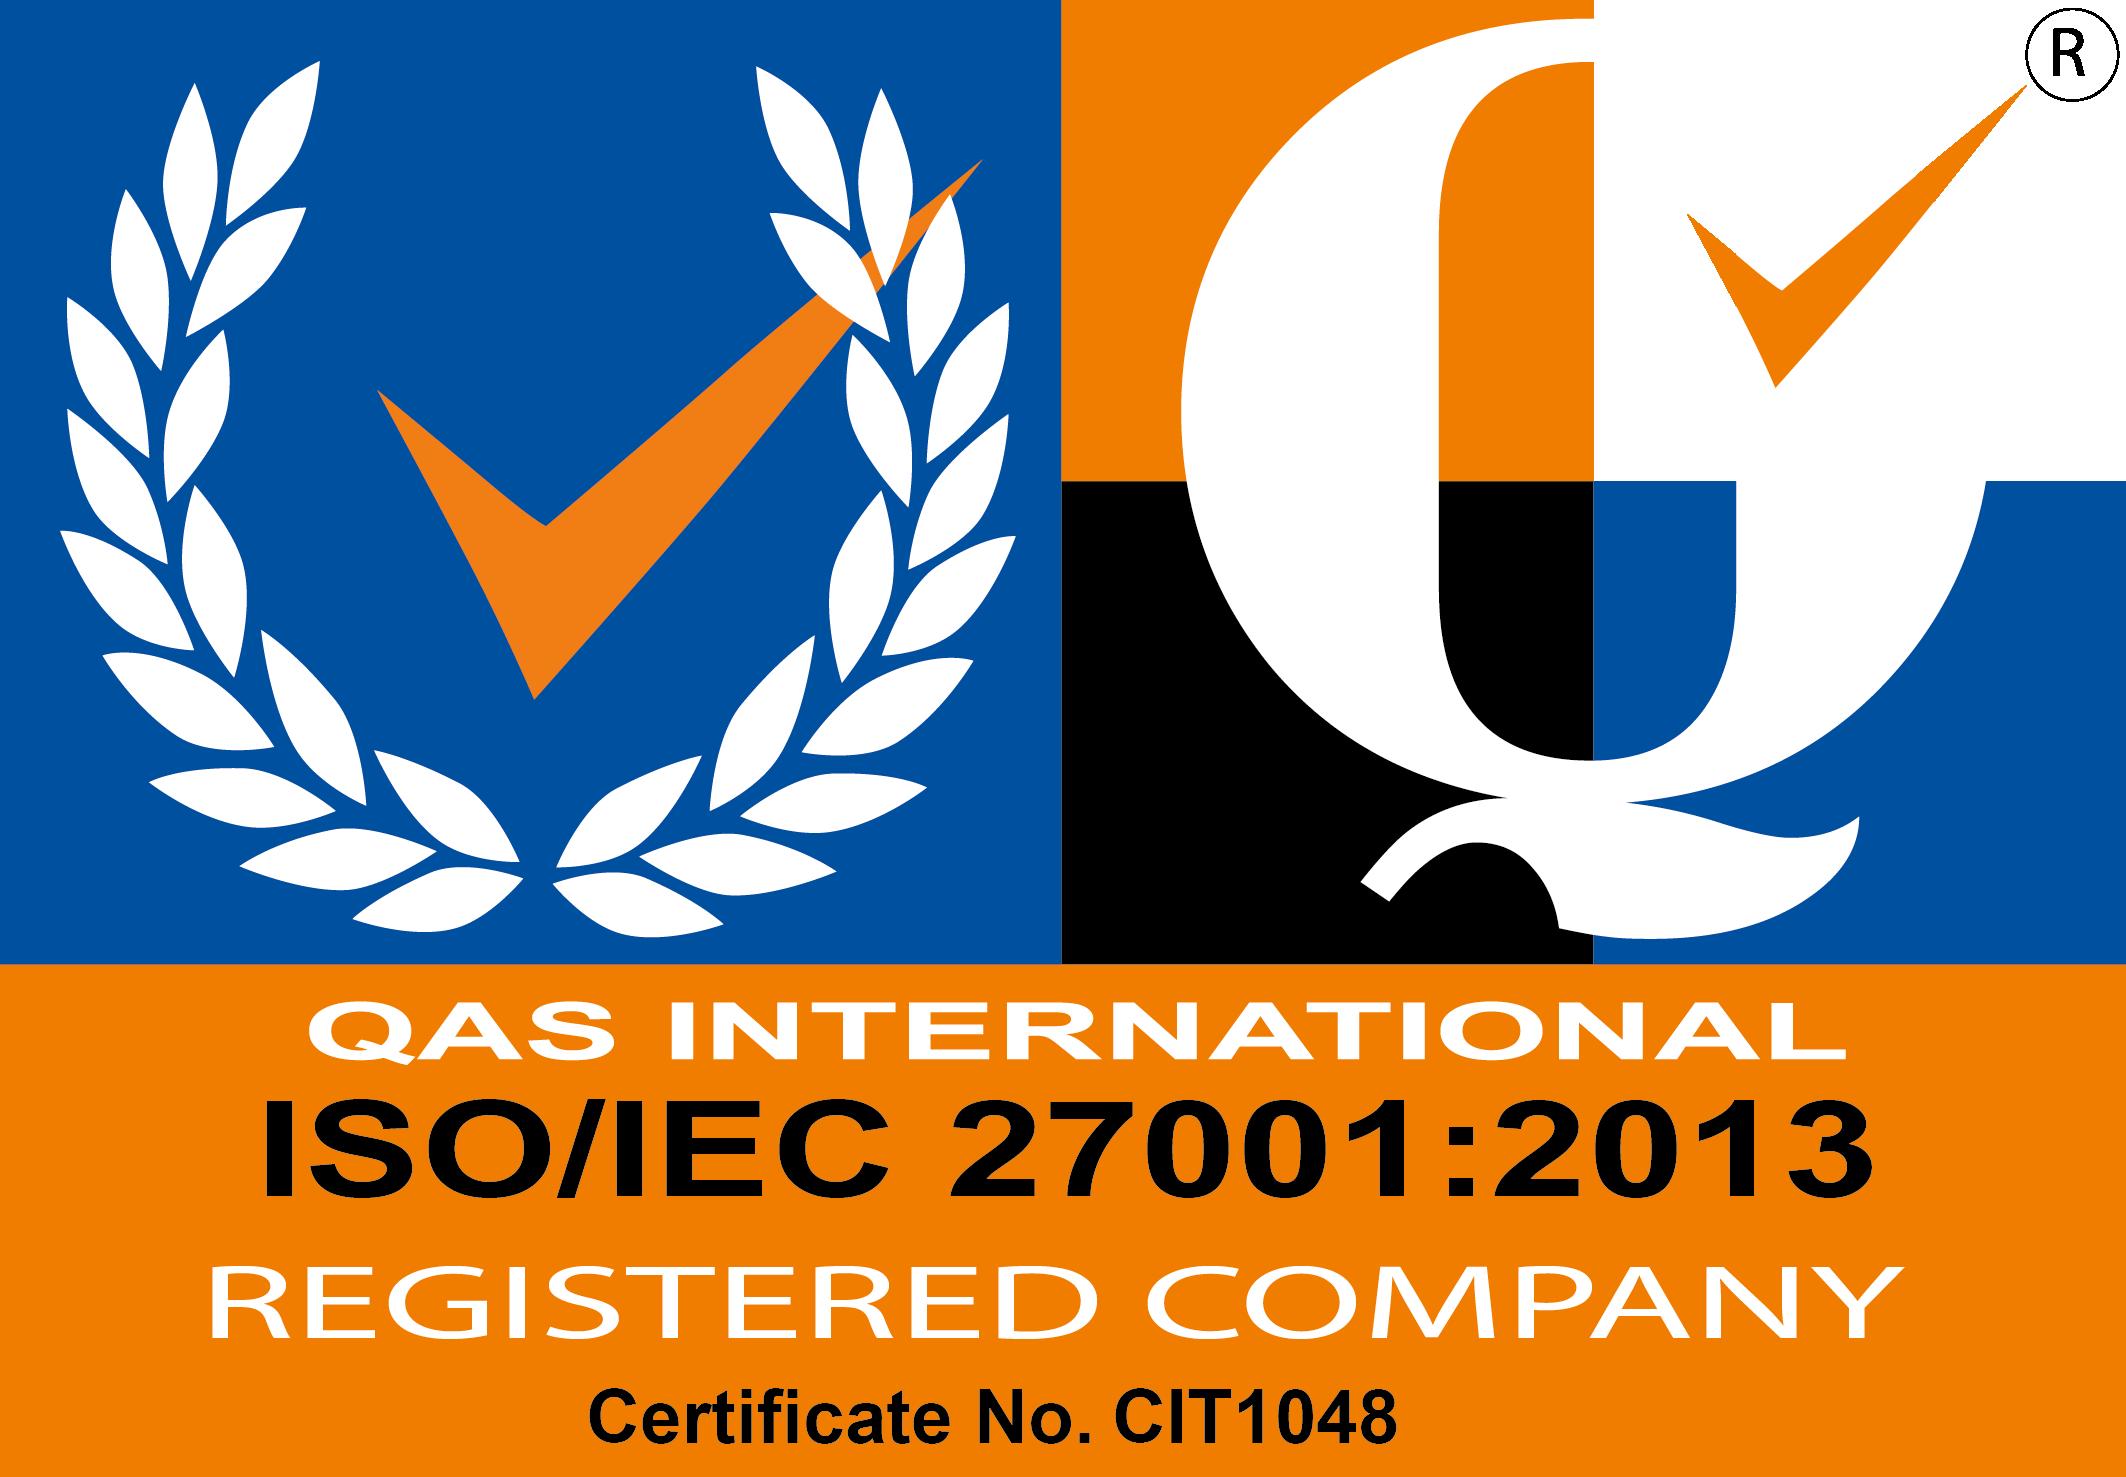 ISO/IEC 27001:2013 Compliance Logo